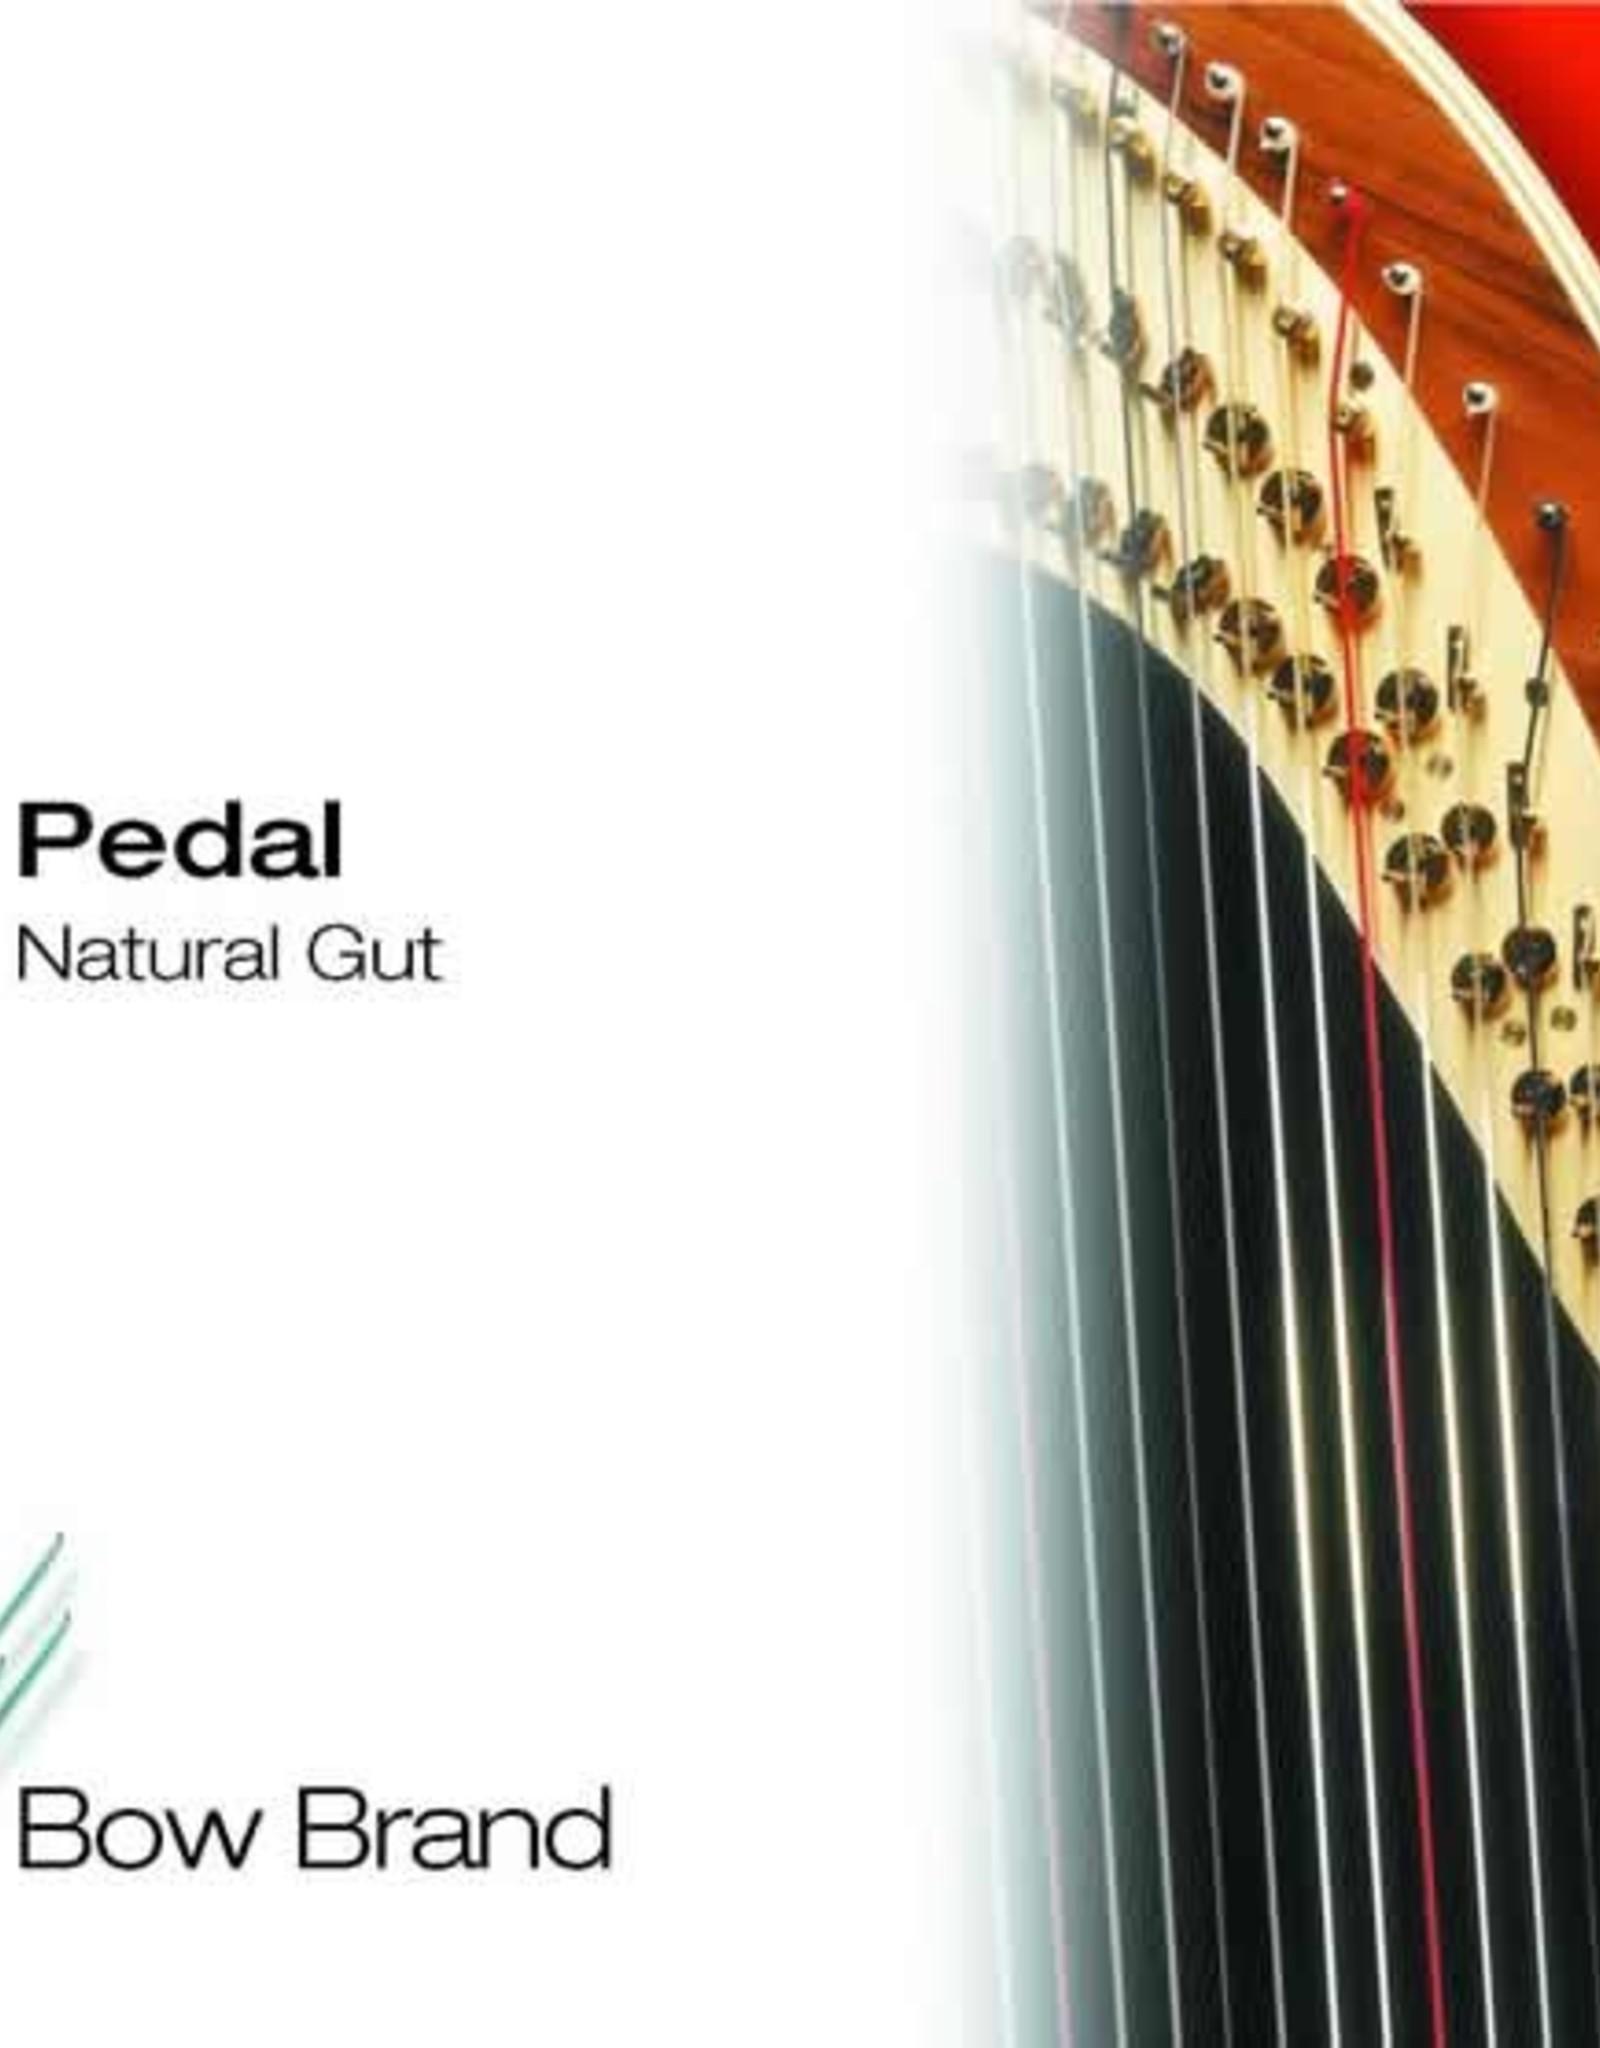 BOW BRAND  pedaal darm - pedal STD GUT (set) - 2de octaaf - inclusief 5% korting